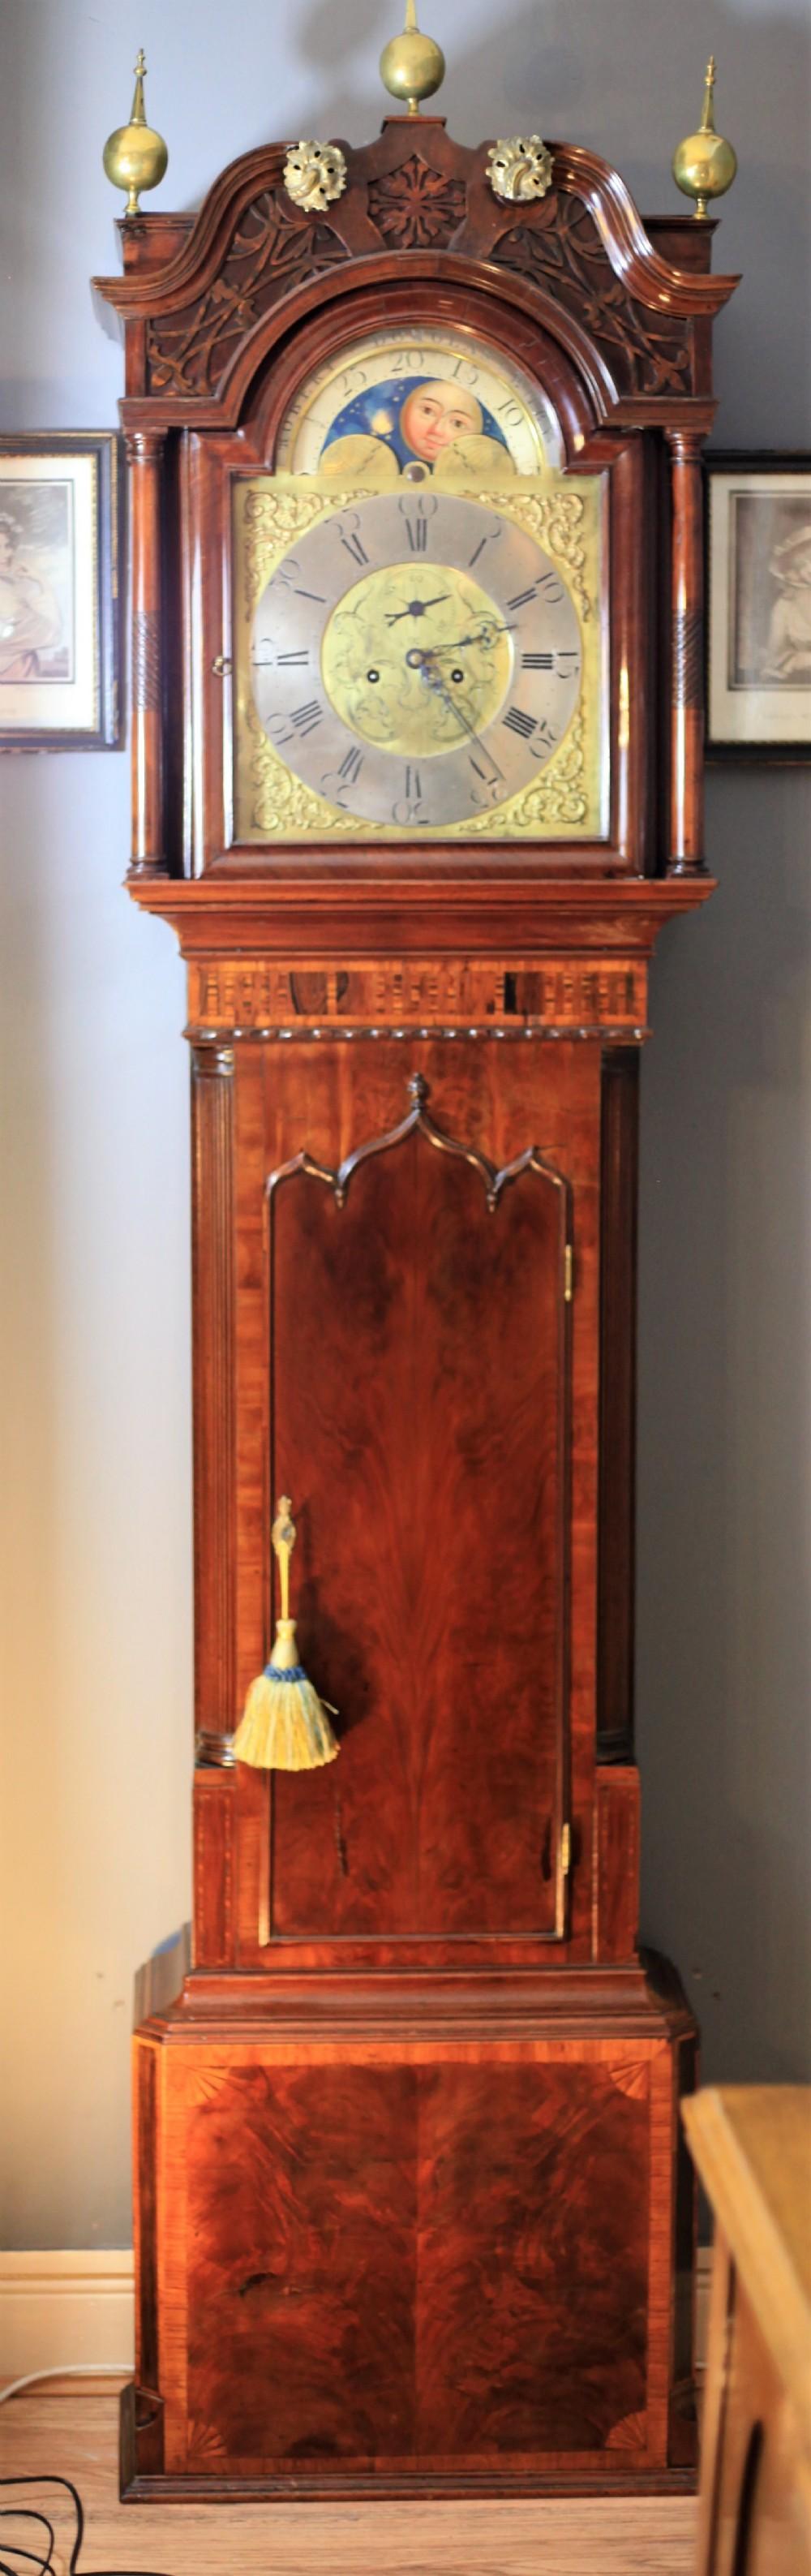 a fine georgian mahogany lancashire longcase clock by robert douglas of bury c1790